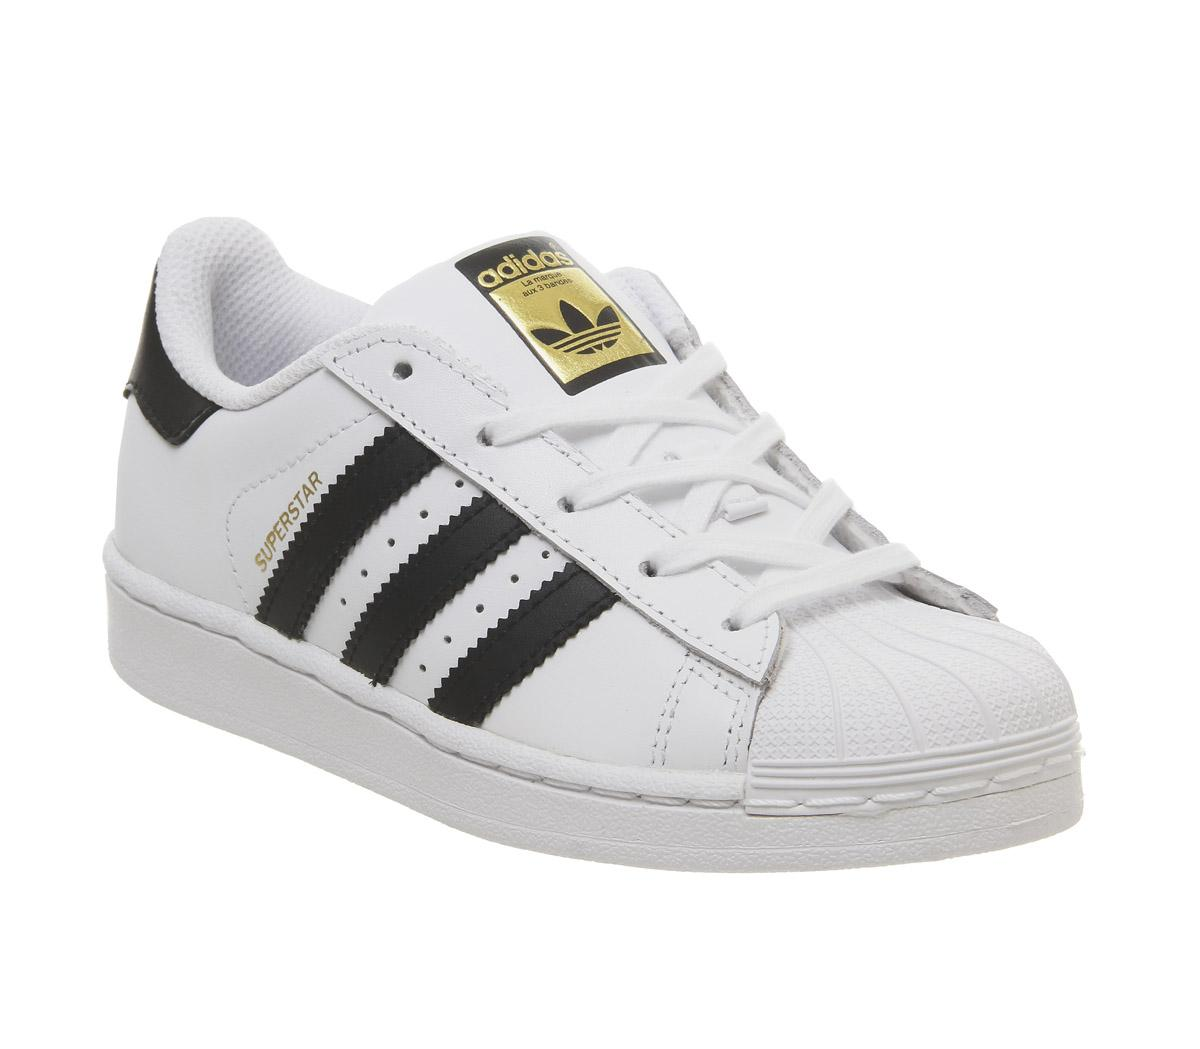 adidas Superstar Kids 10-2 Trainers White Core Black - Unisex